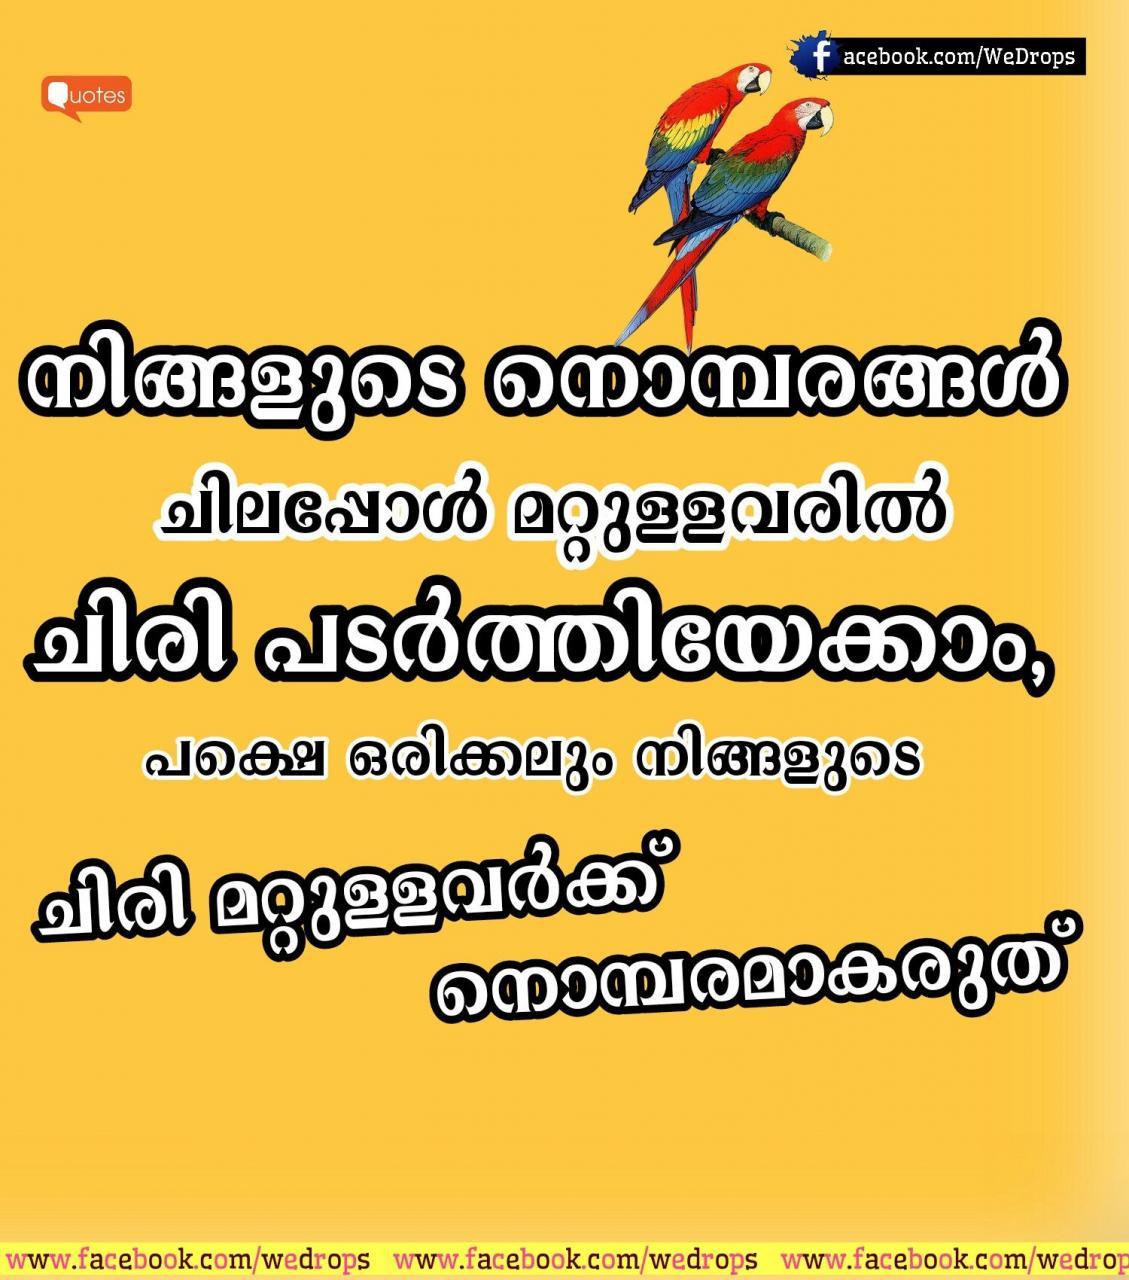 Posts About Malayalam S S On Malayalam S Smalayalam Quotesmalayalam Greetingsstatussmswishesmalayalam Cover P Ostimeline Cover